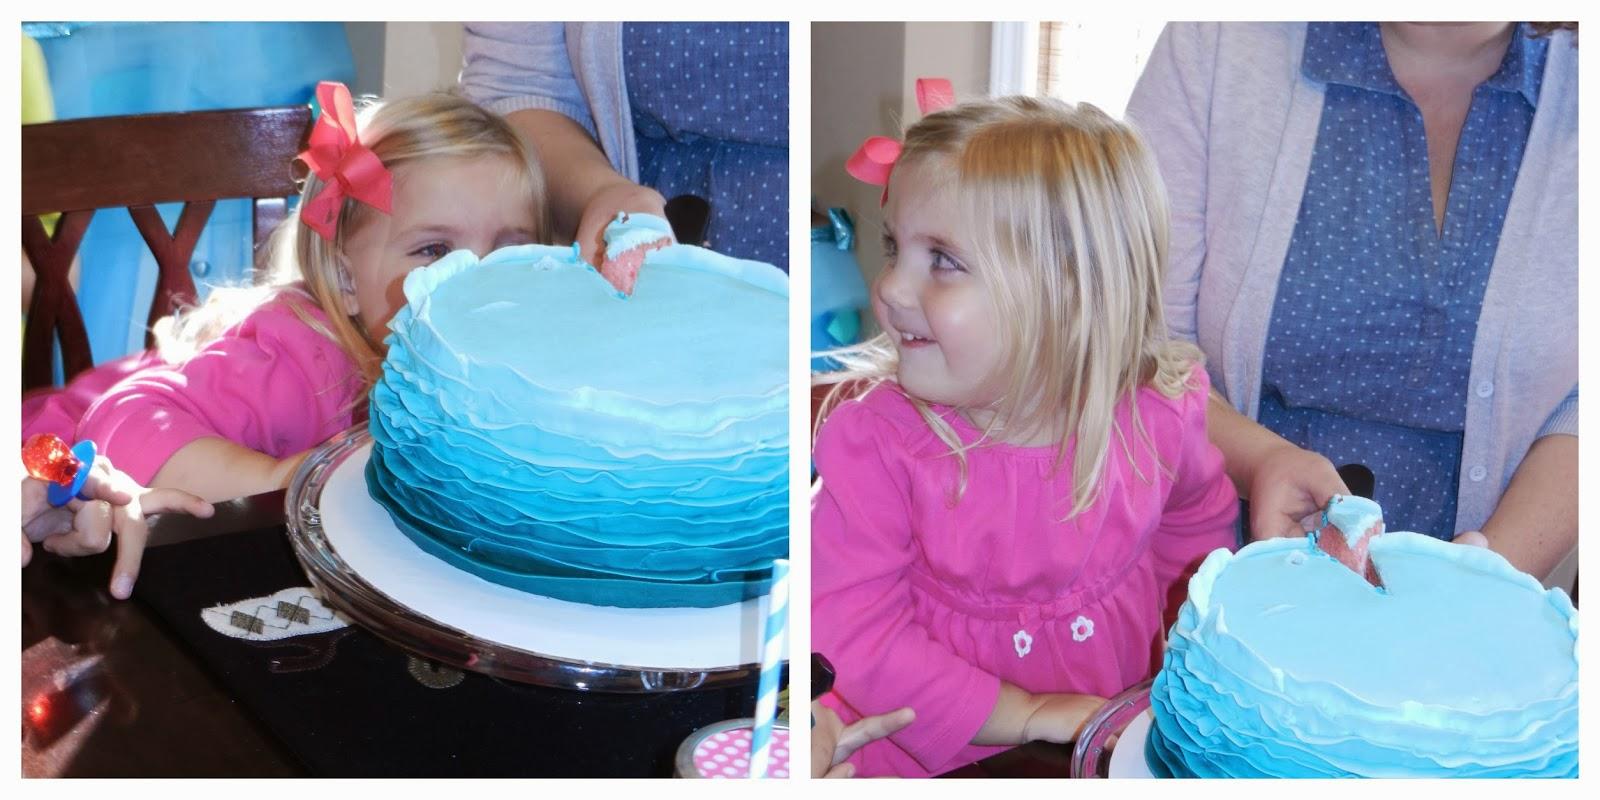 Canada Goose down sale fake - The Subfertile Frugalista: Wren's Mermaid Birthday Party